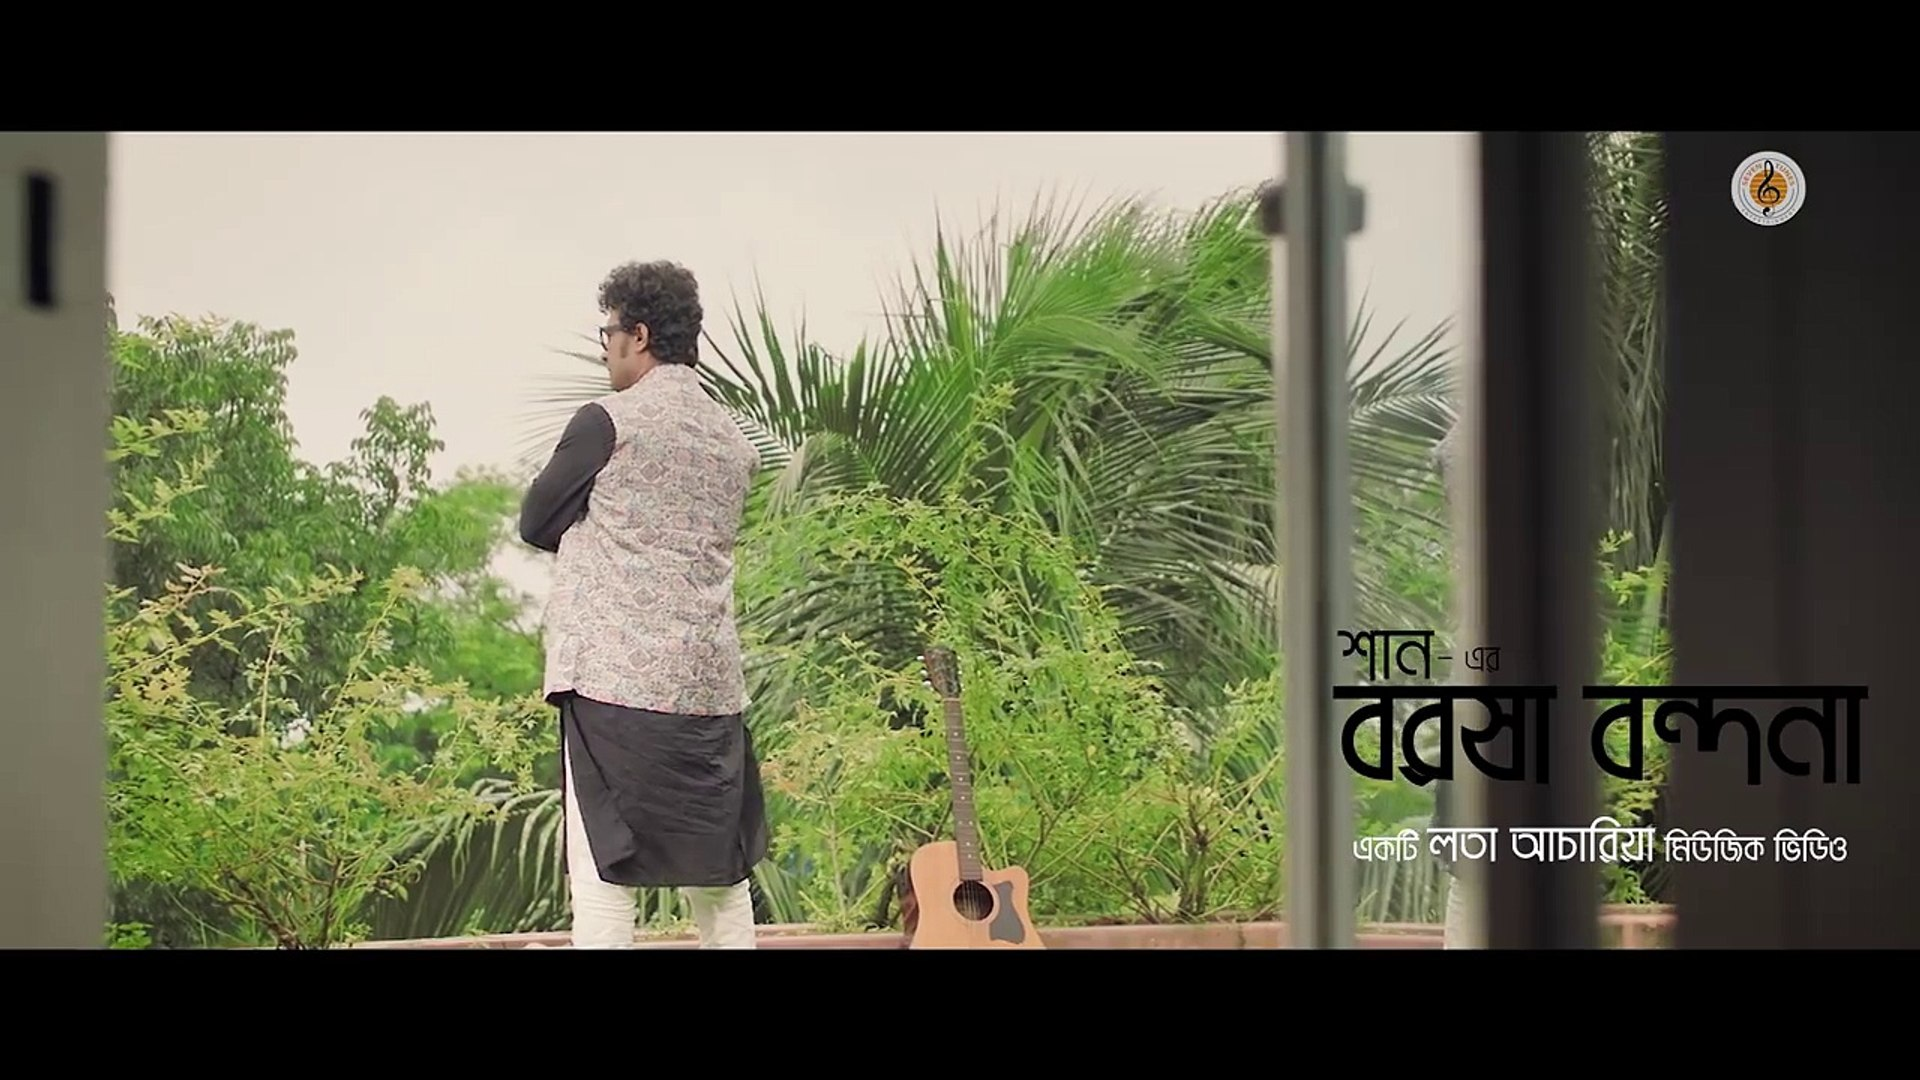 Borsha+Bondona+I+Shan+I+বরষাবন্দনা+I+Shomeshwar+Oli+I+New+Bangla+Song+2018